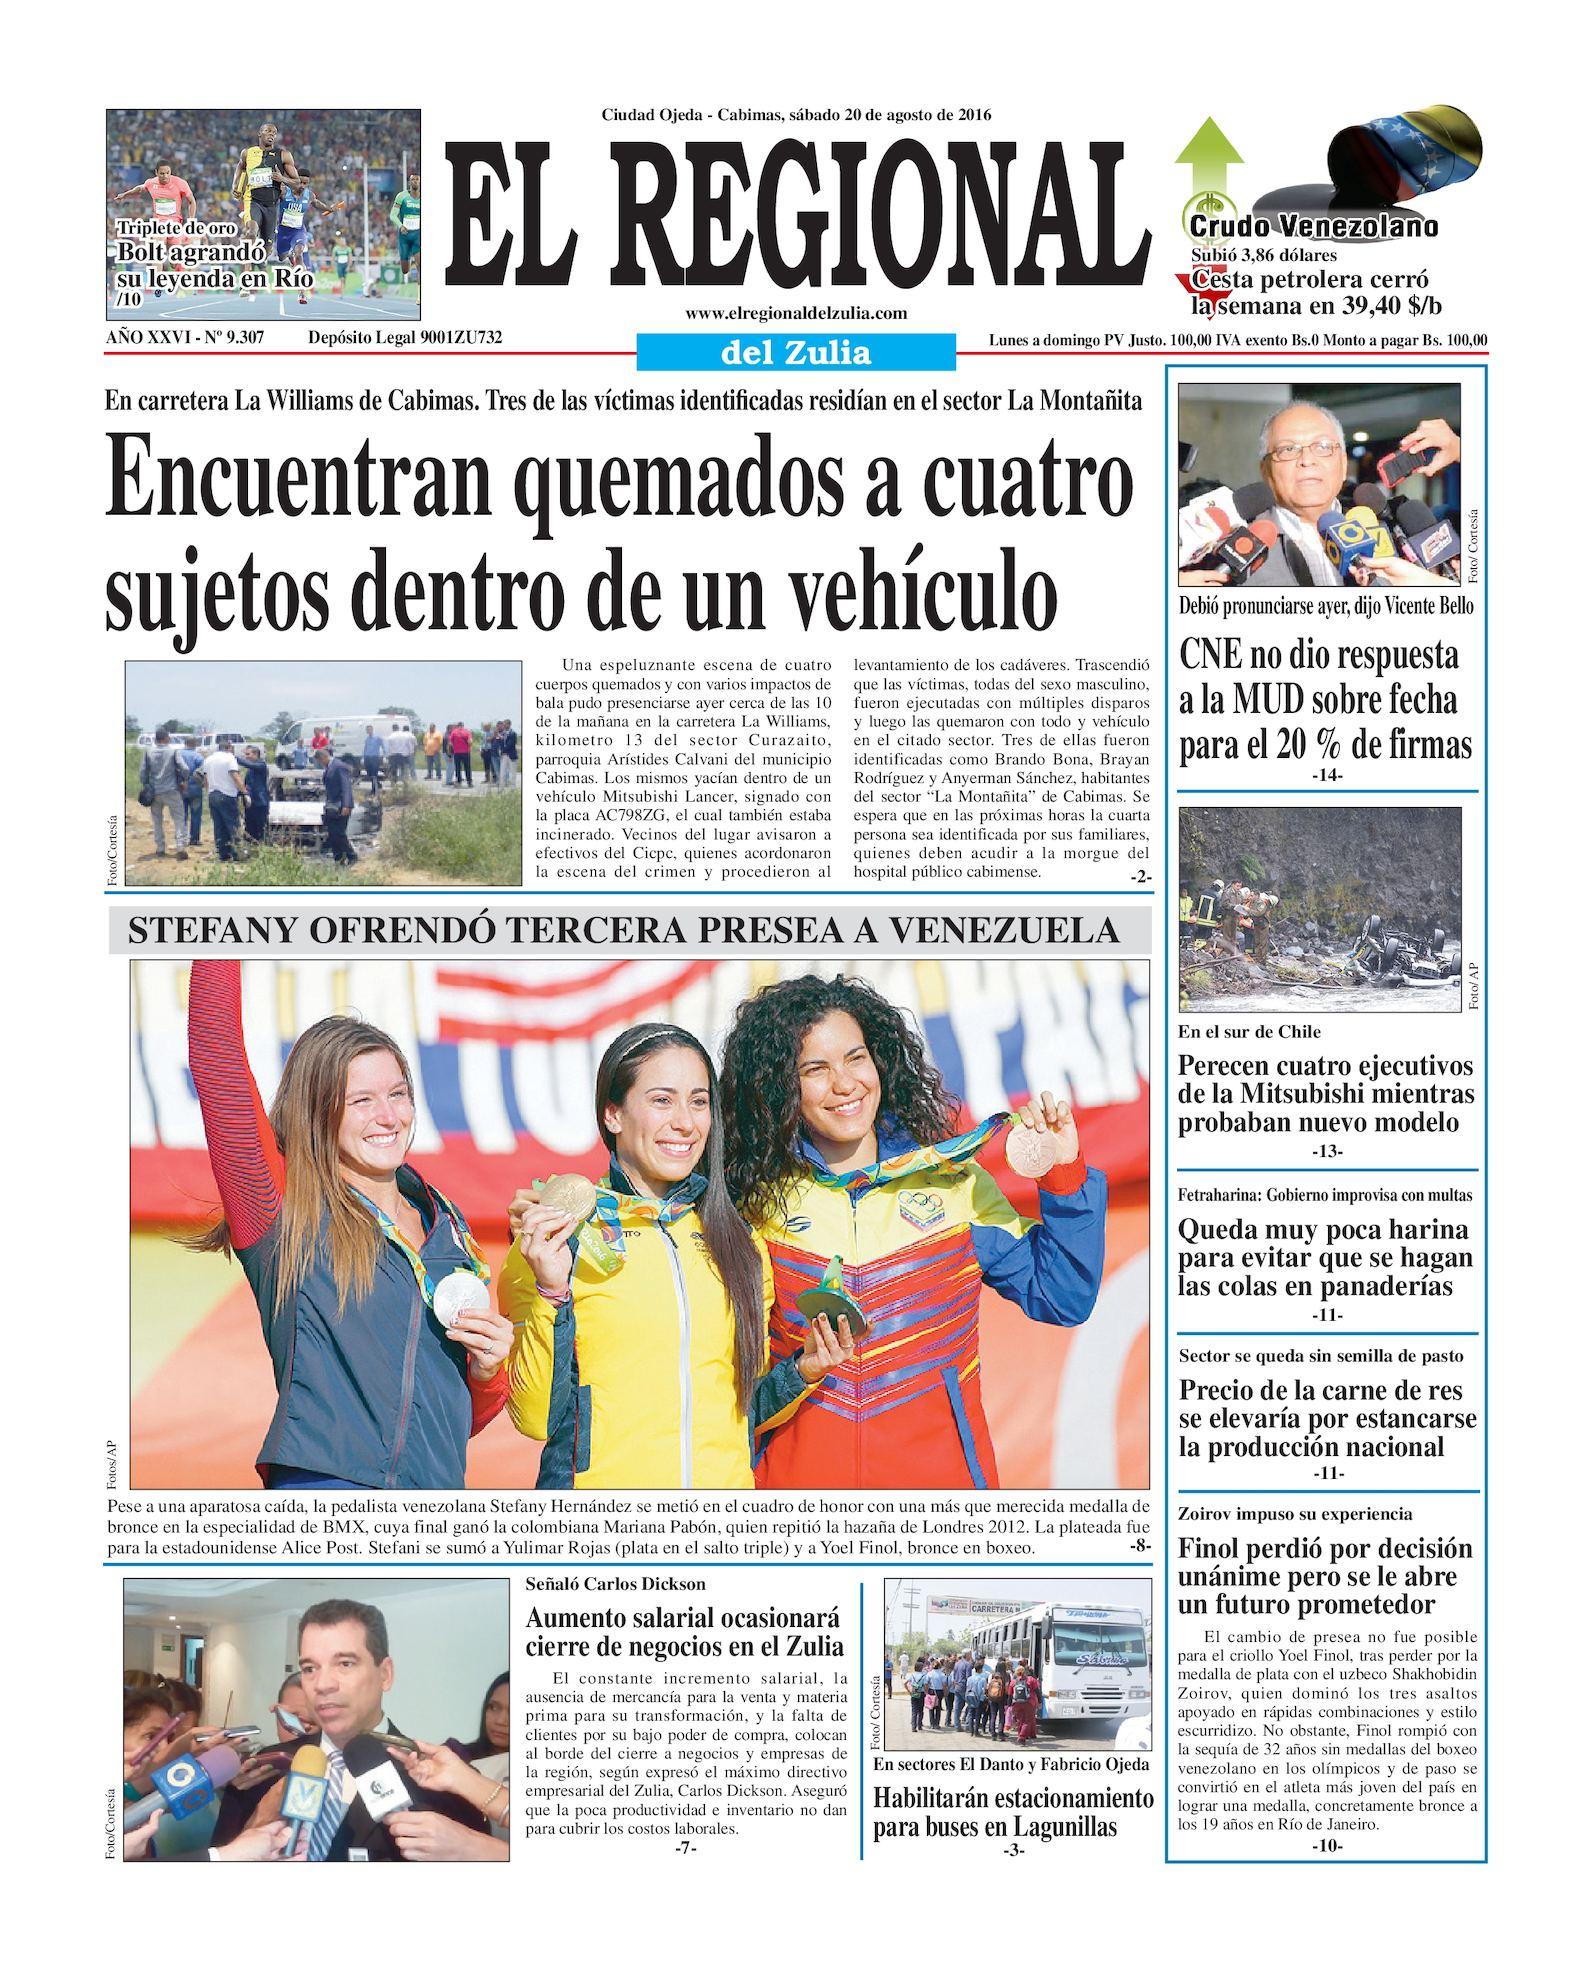 Calaméo - El Regional del Zulia 20-08-2016